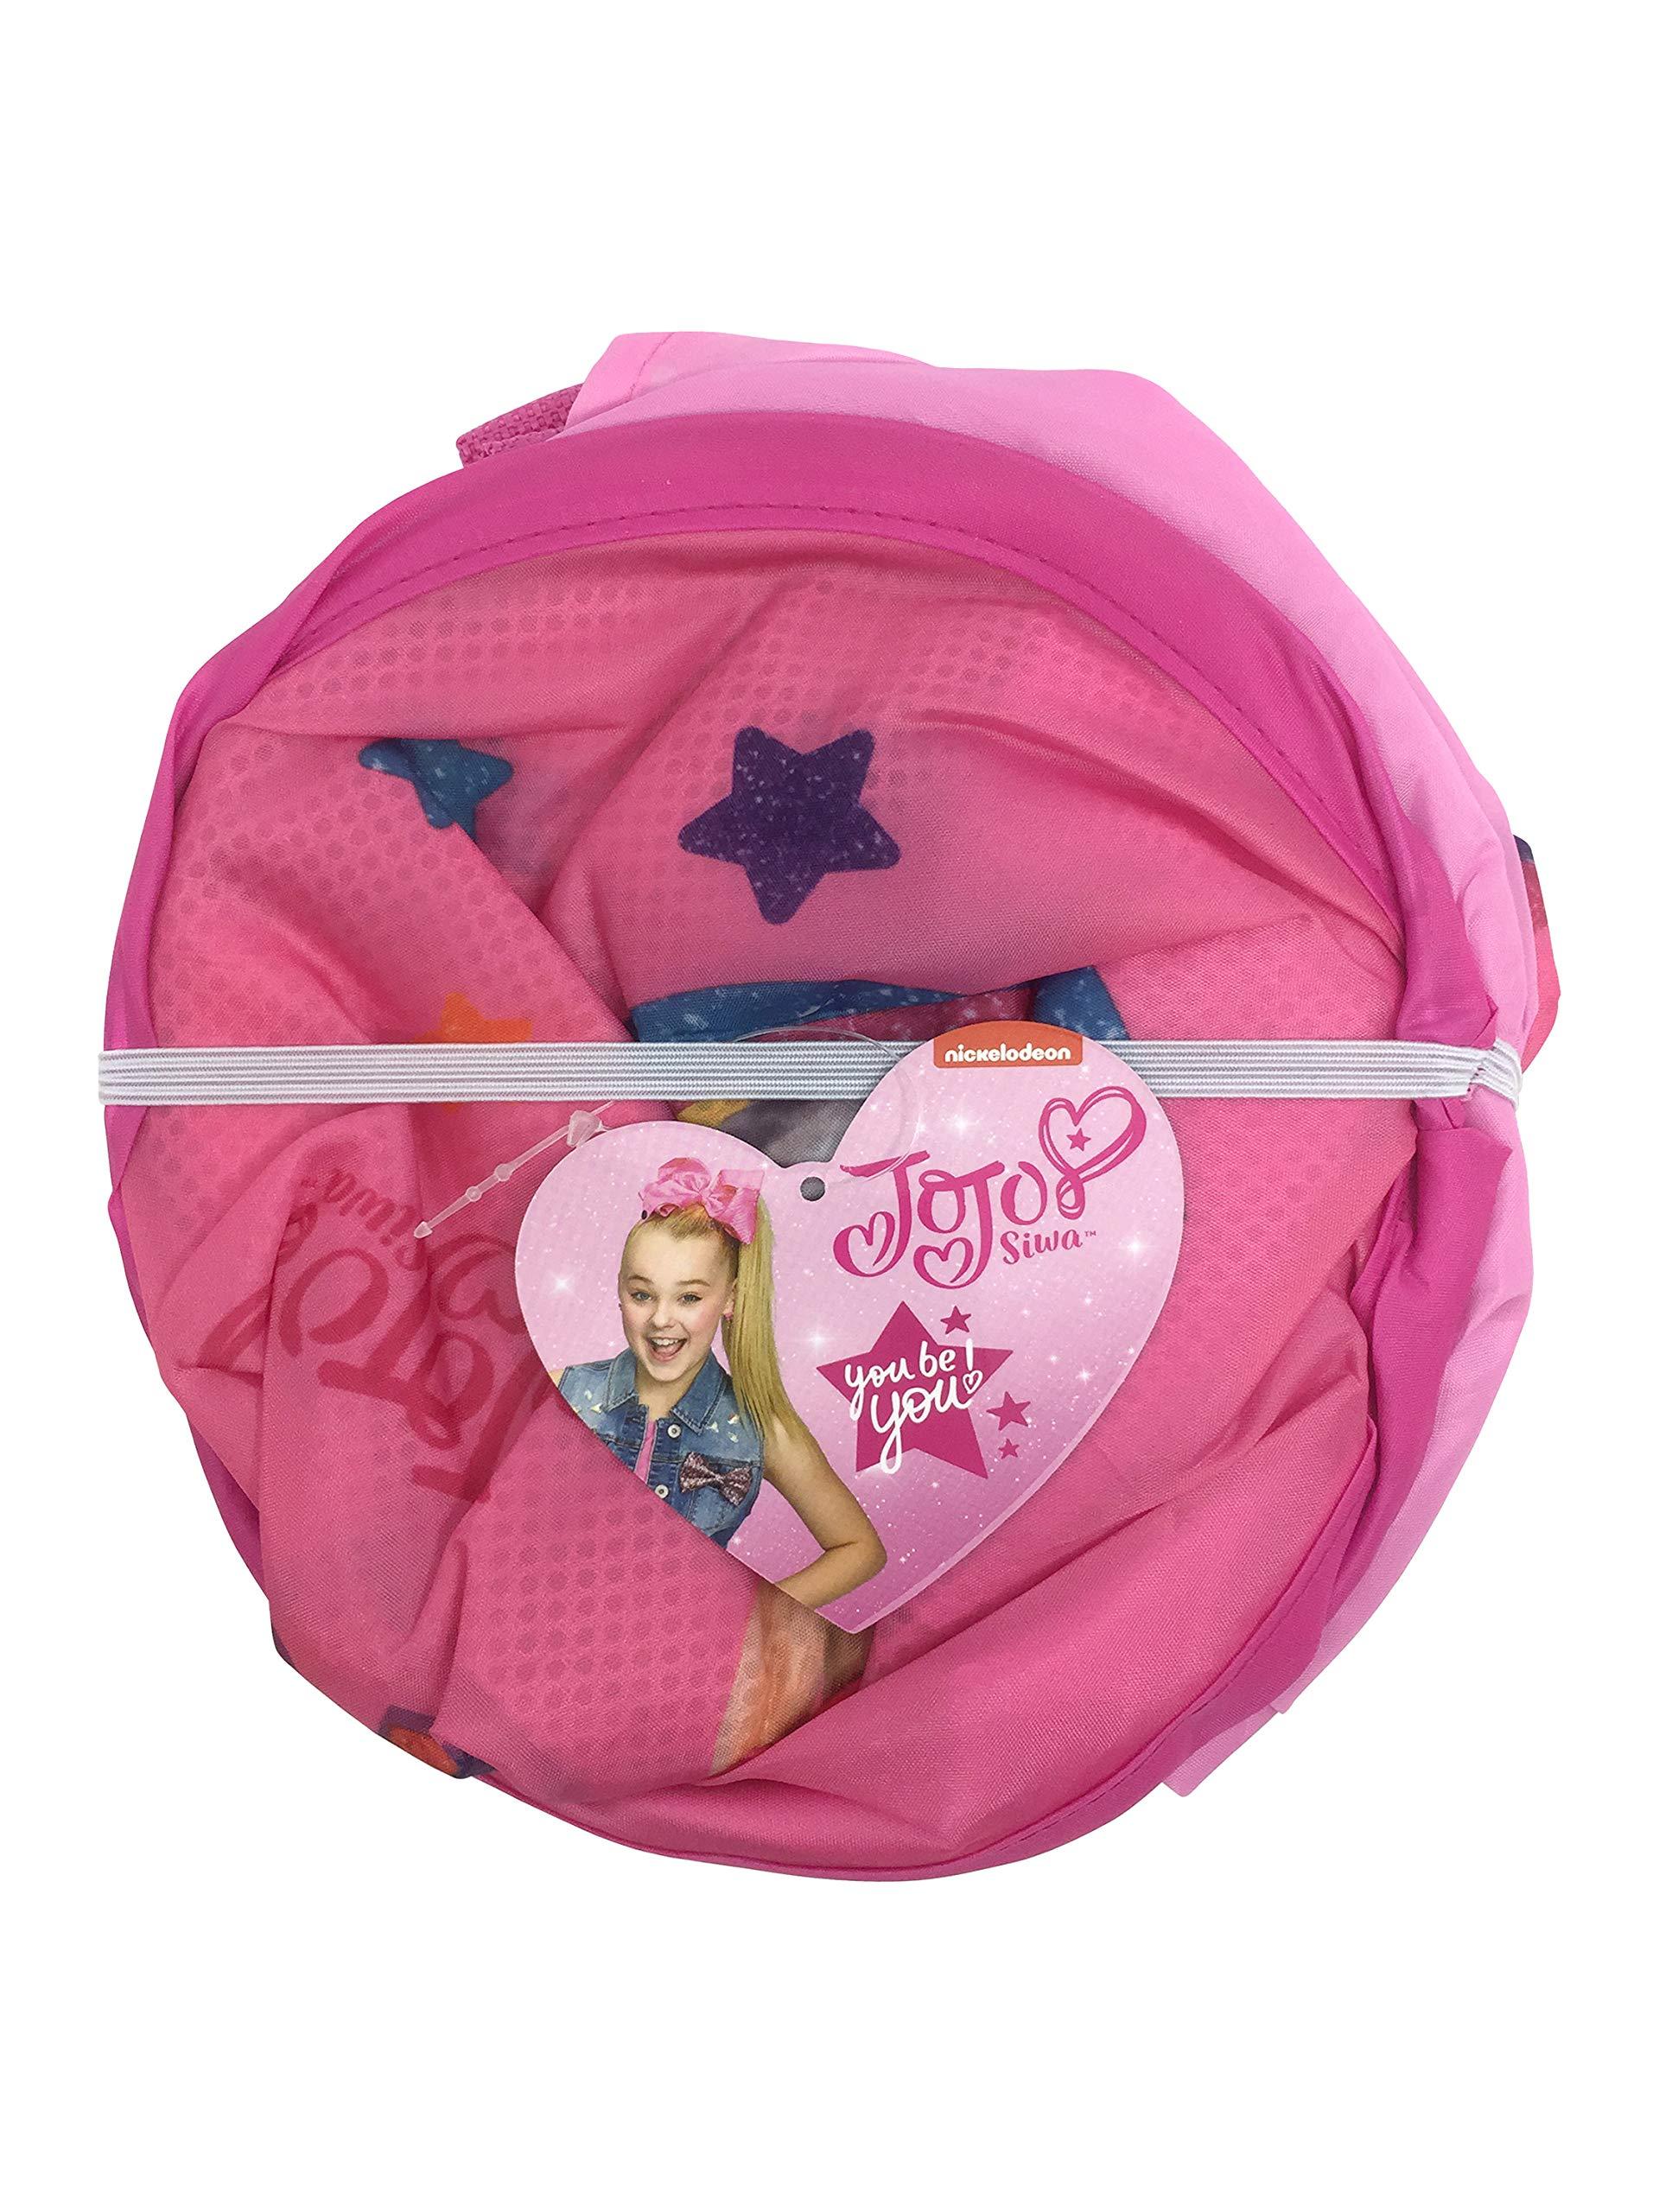 Jay Franco Nickelodeon JoJo Siwa Peace Love Music Pop Up Hamper, Pink